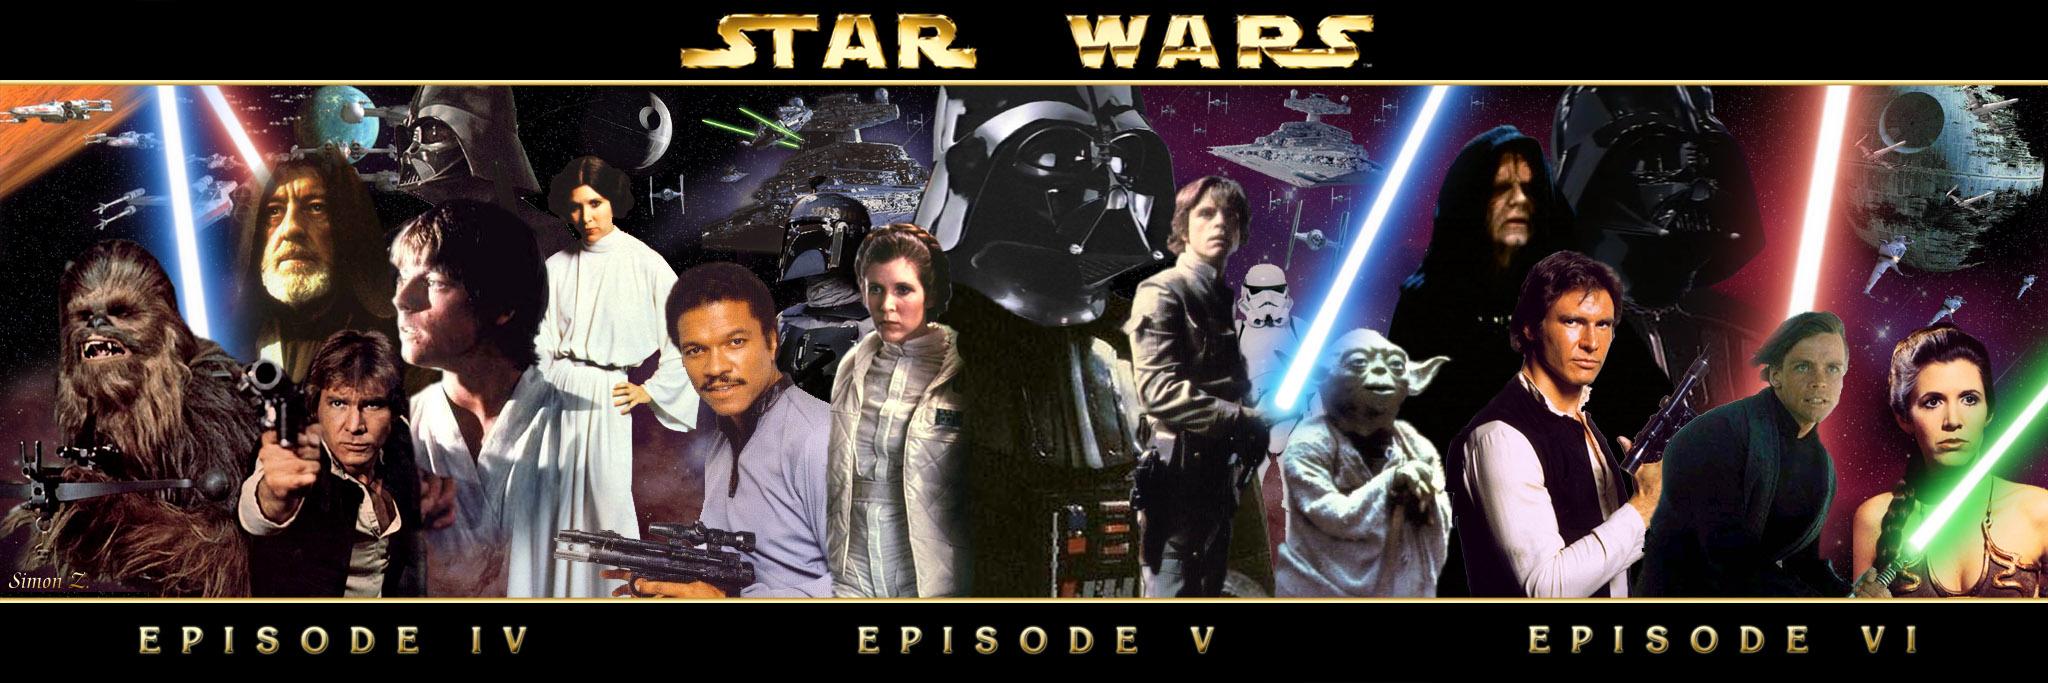 Star Wars Episode 4 Wallpaper Posted By Sarah Mercado